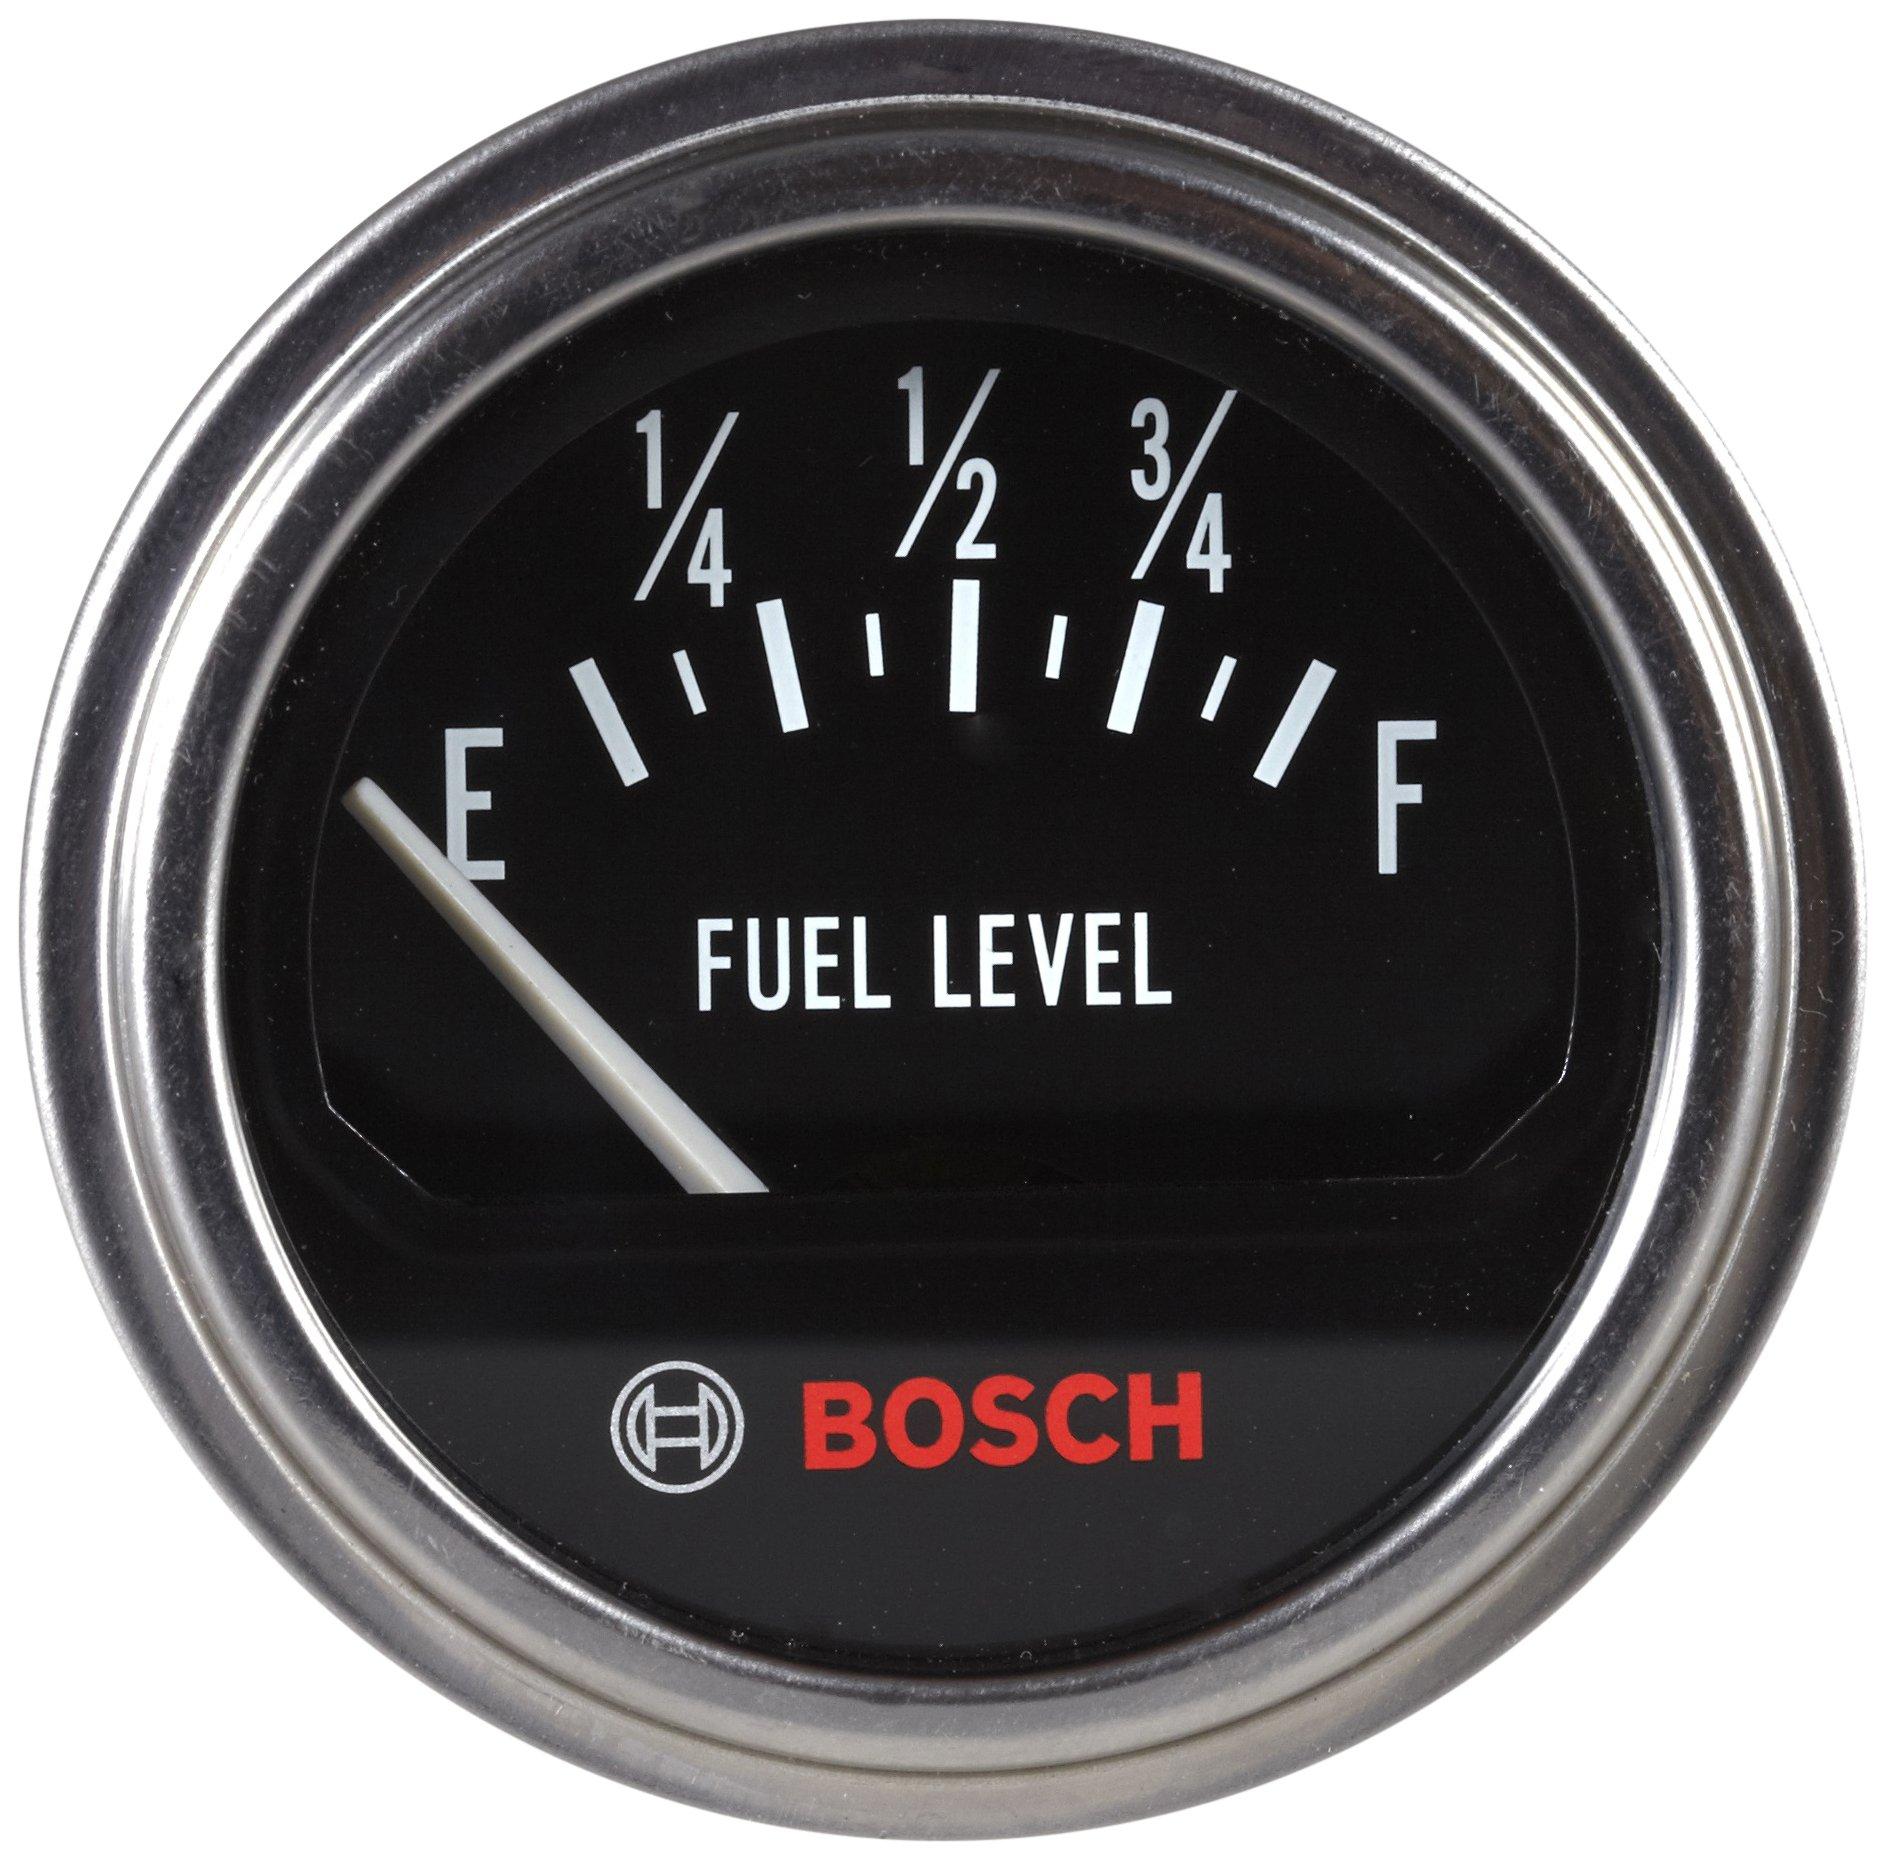 Bosch SP0F000031 Retro Line 2'' Electric Fuel Level Gauge